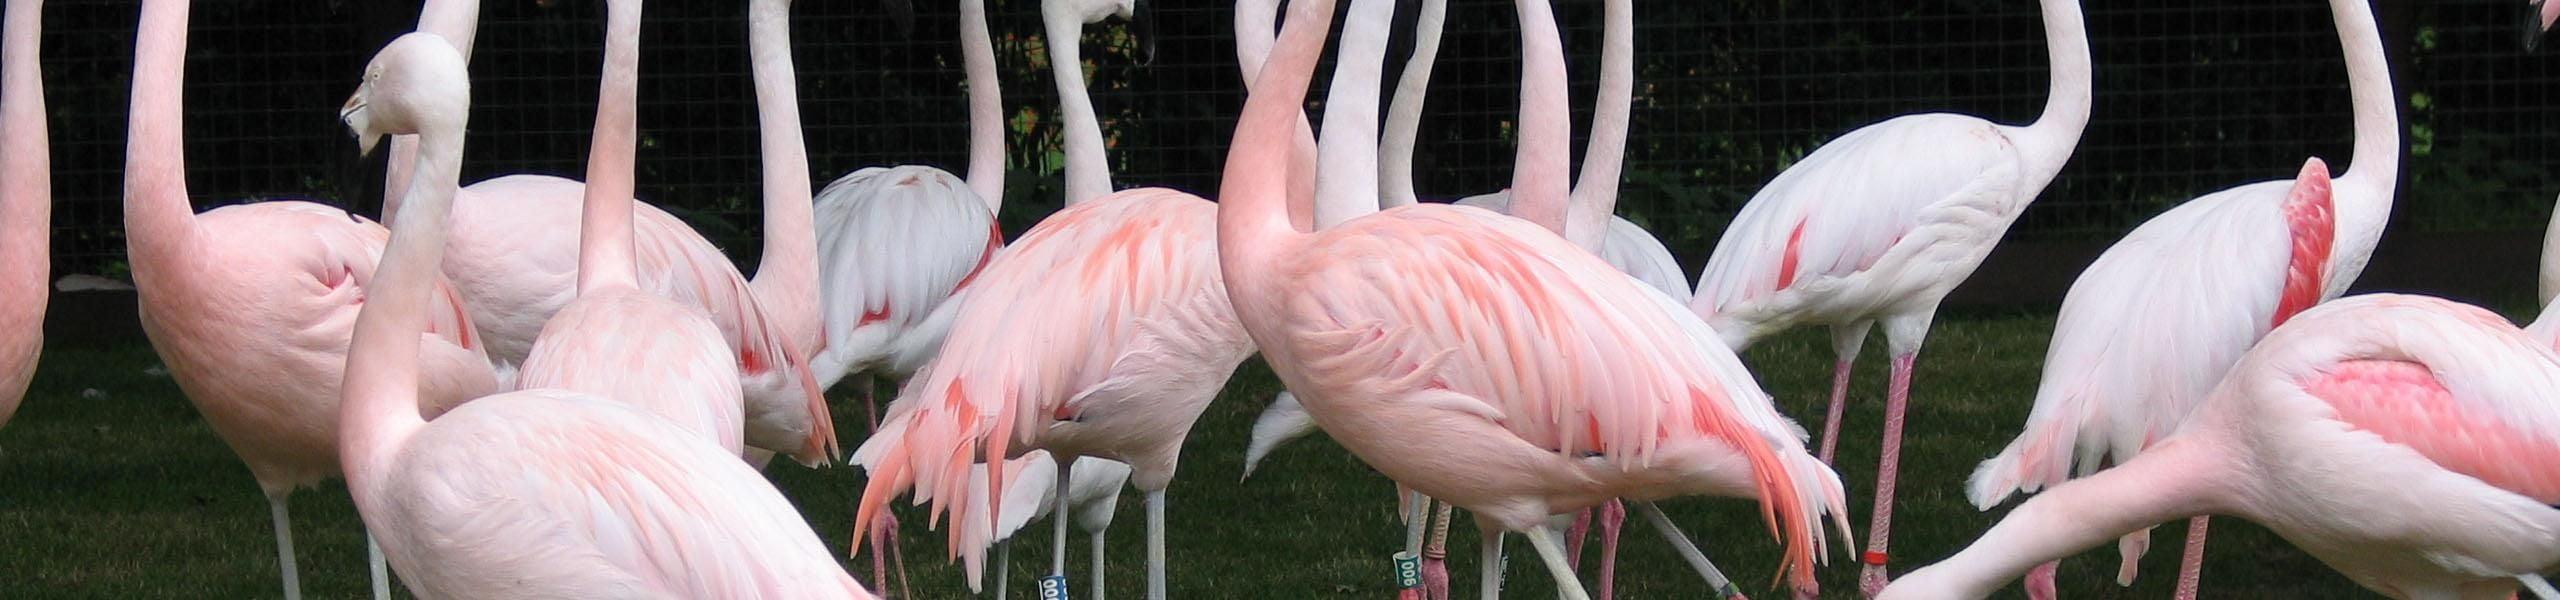 Meet Our Flamingos and Pelicans | Paultons Park